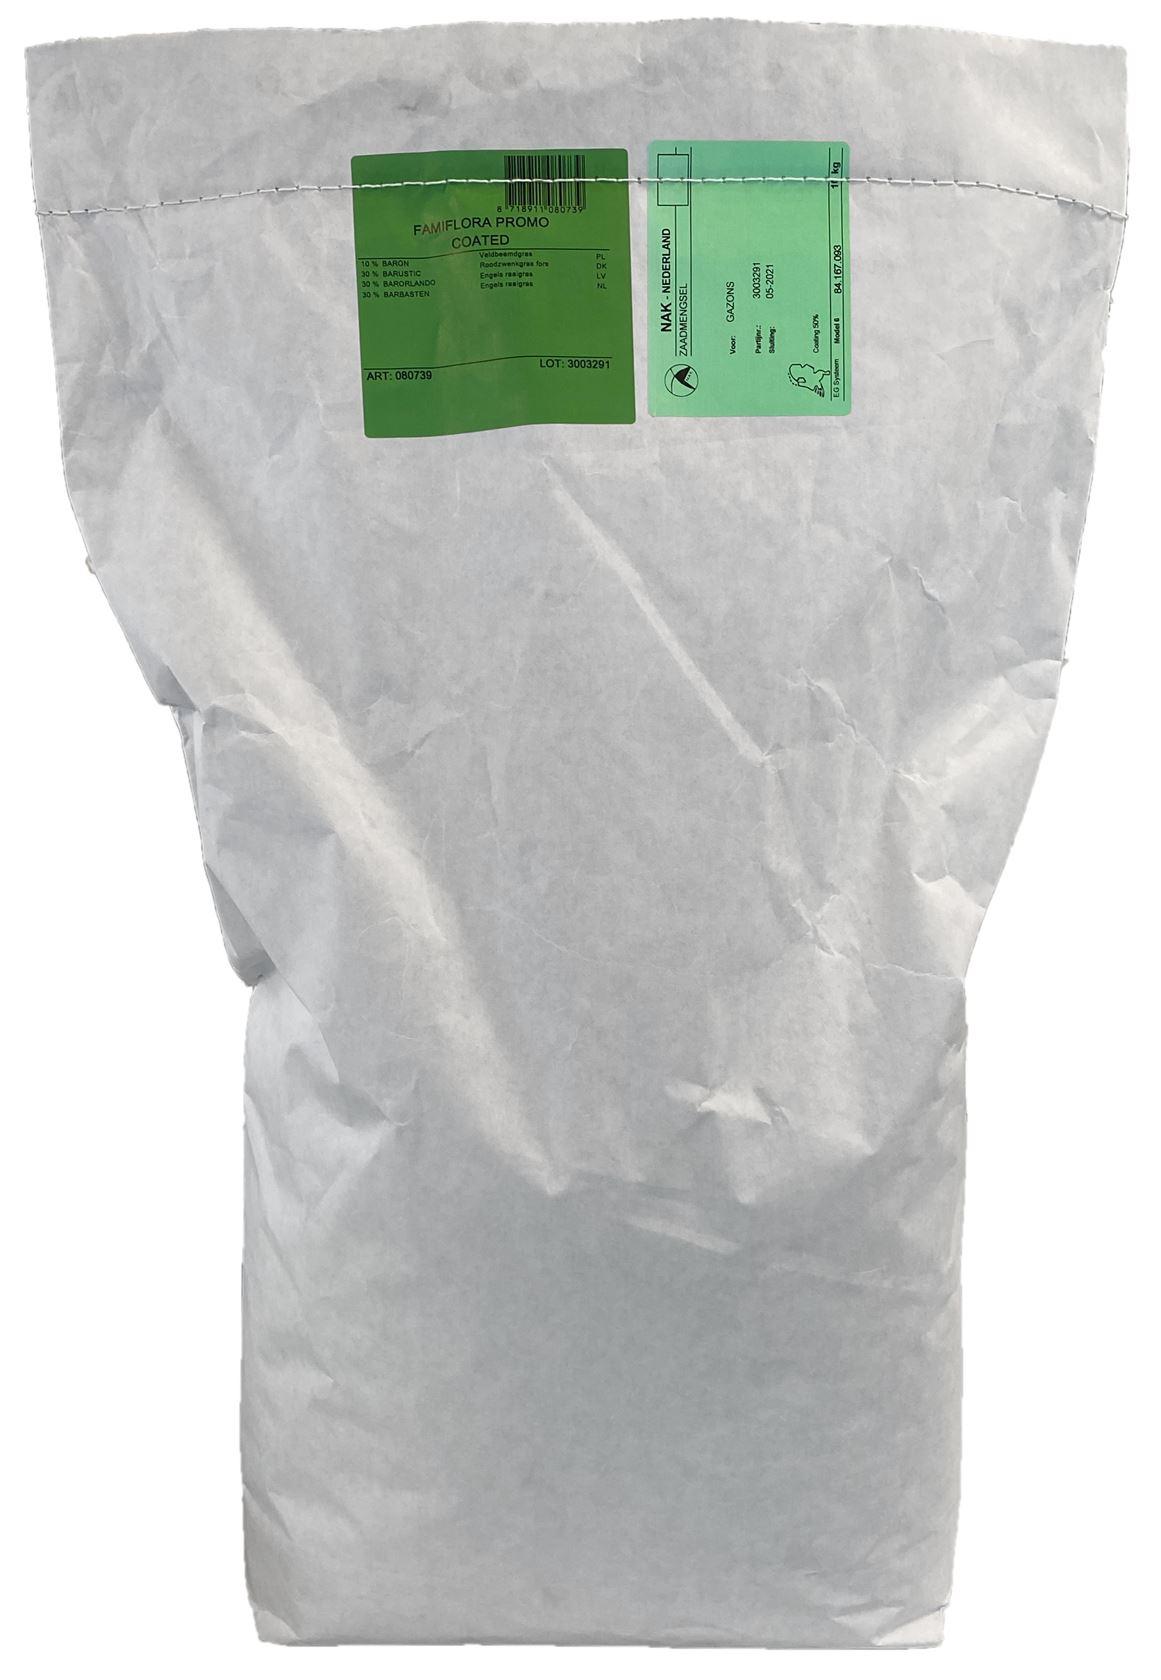 Famiflora-promo-graszaad-10kg-speel-sport-gecoat-Barenbrug-graszaad